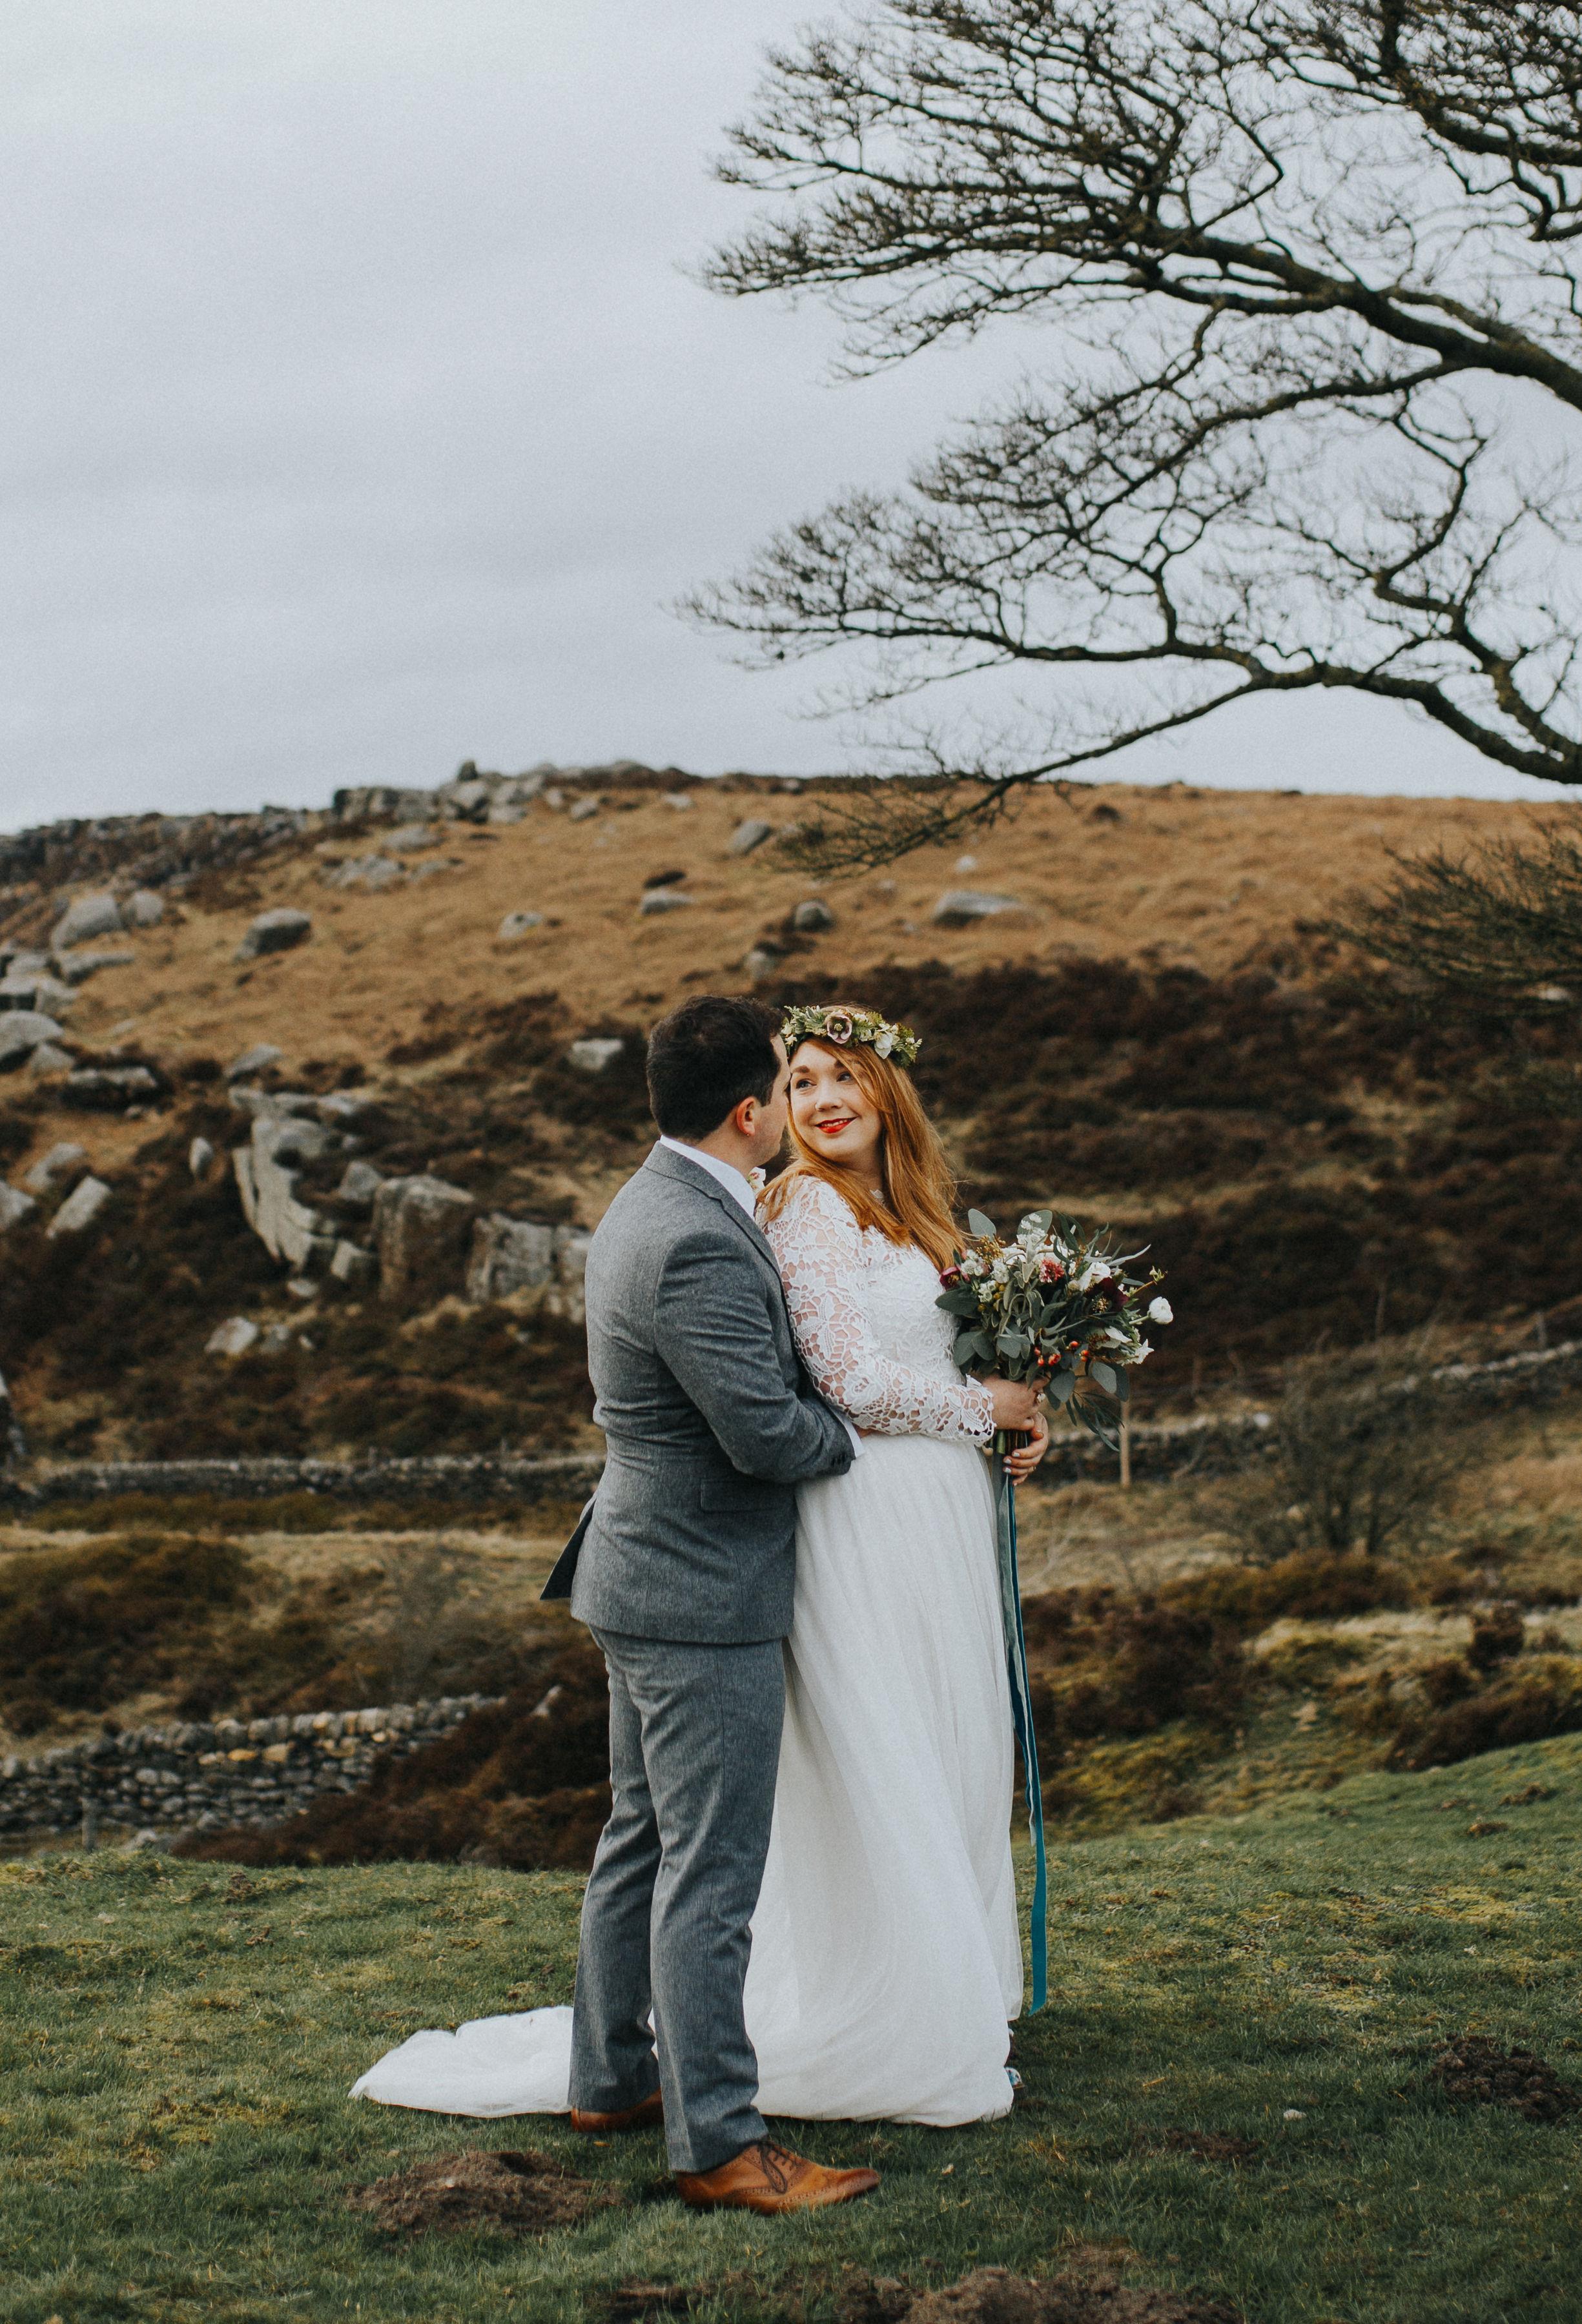 Rosie-bespoke-lace-long sleeved-tulle-wedding-dress-winter-peak district-susanna greening-1.jpg